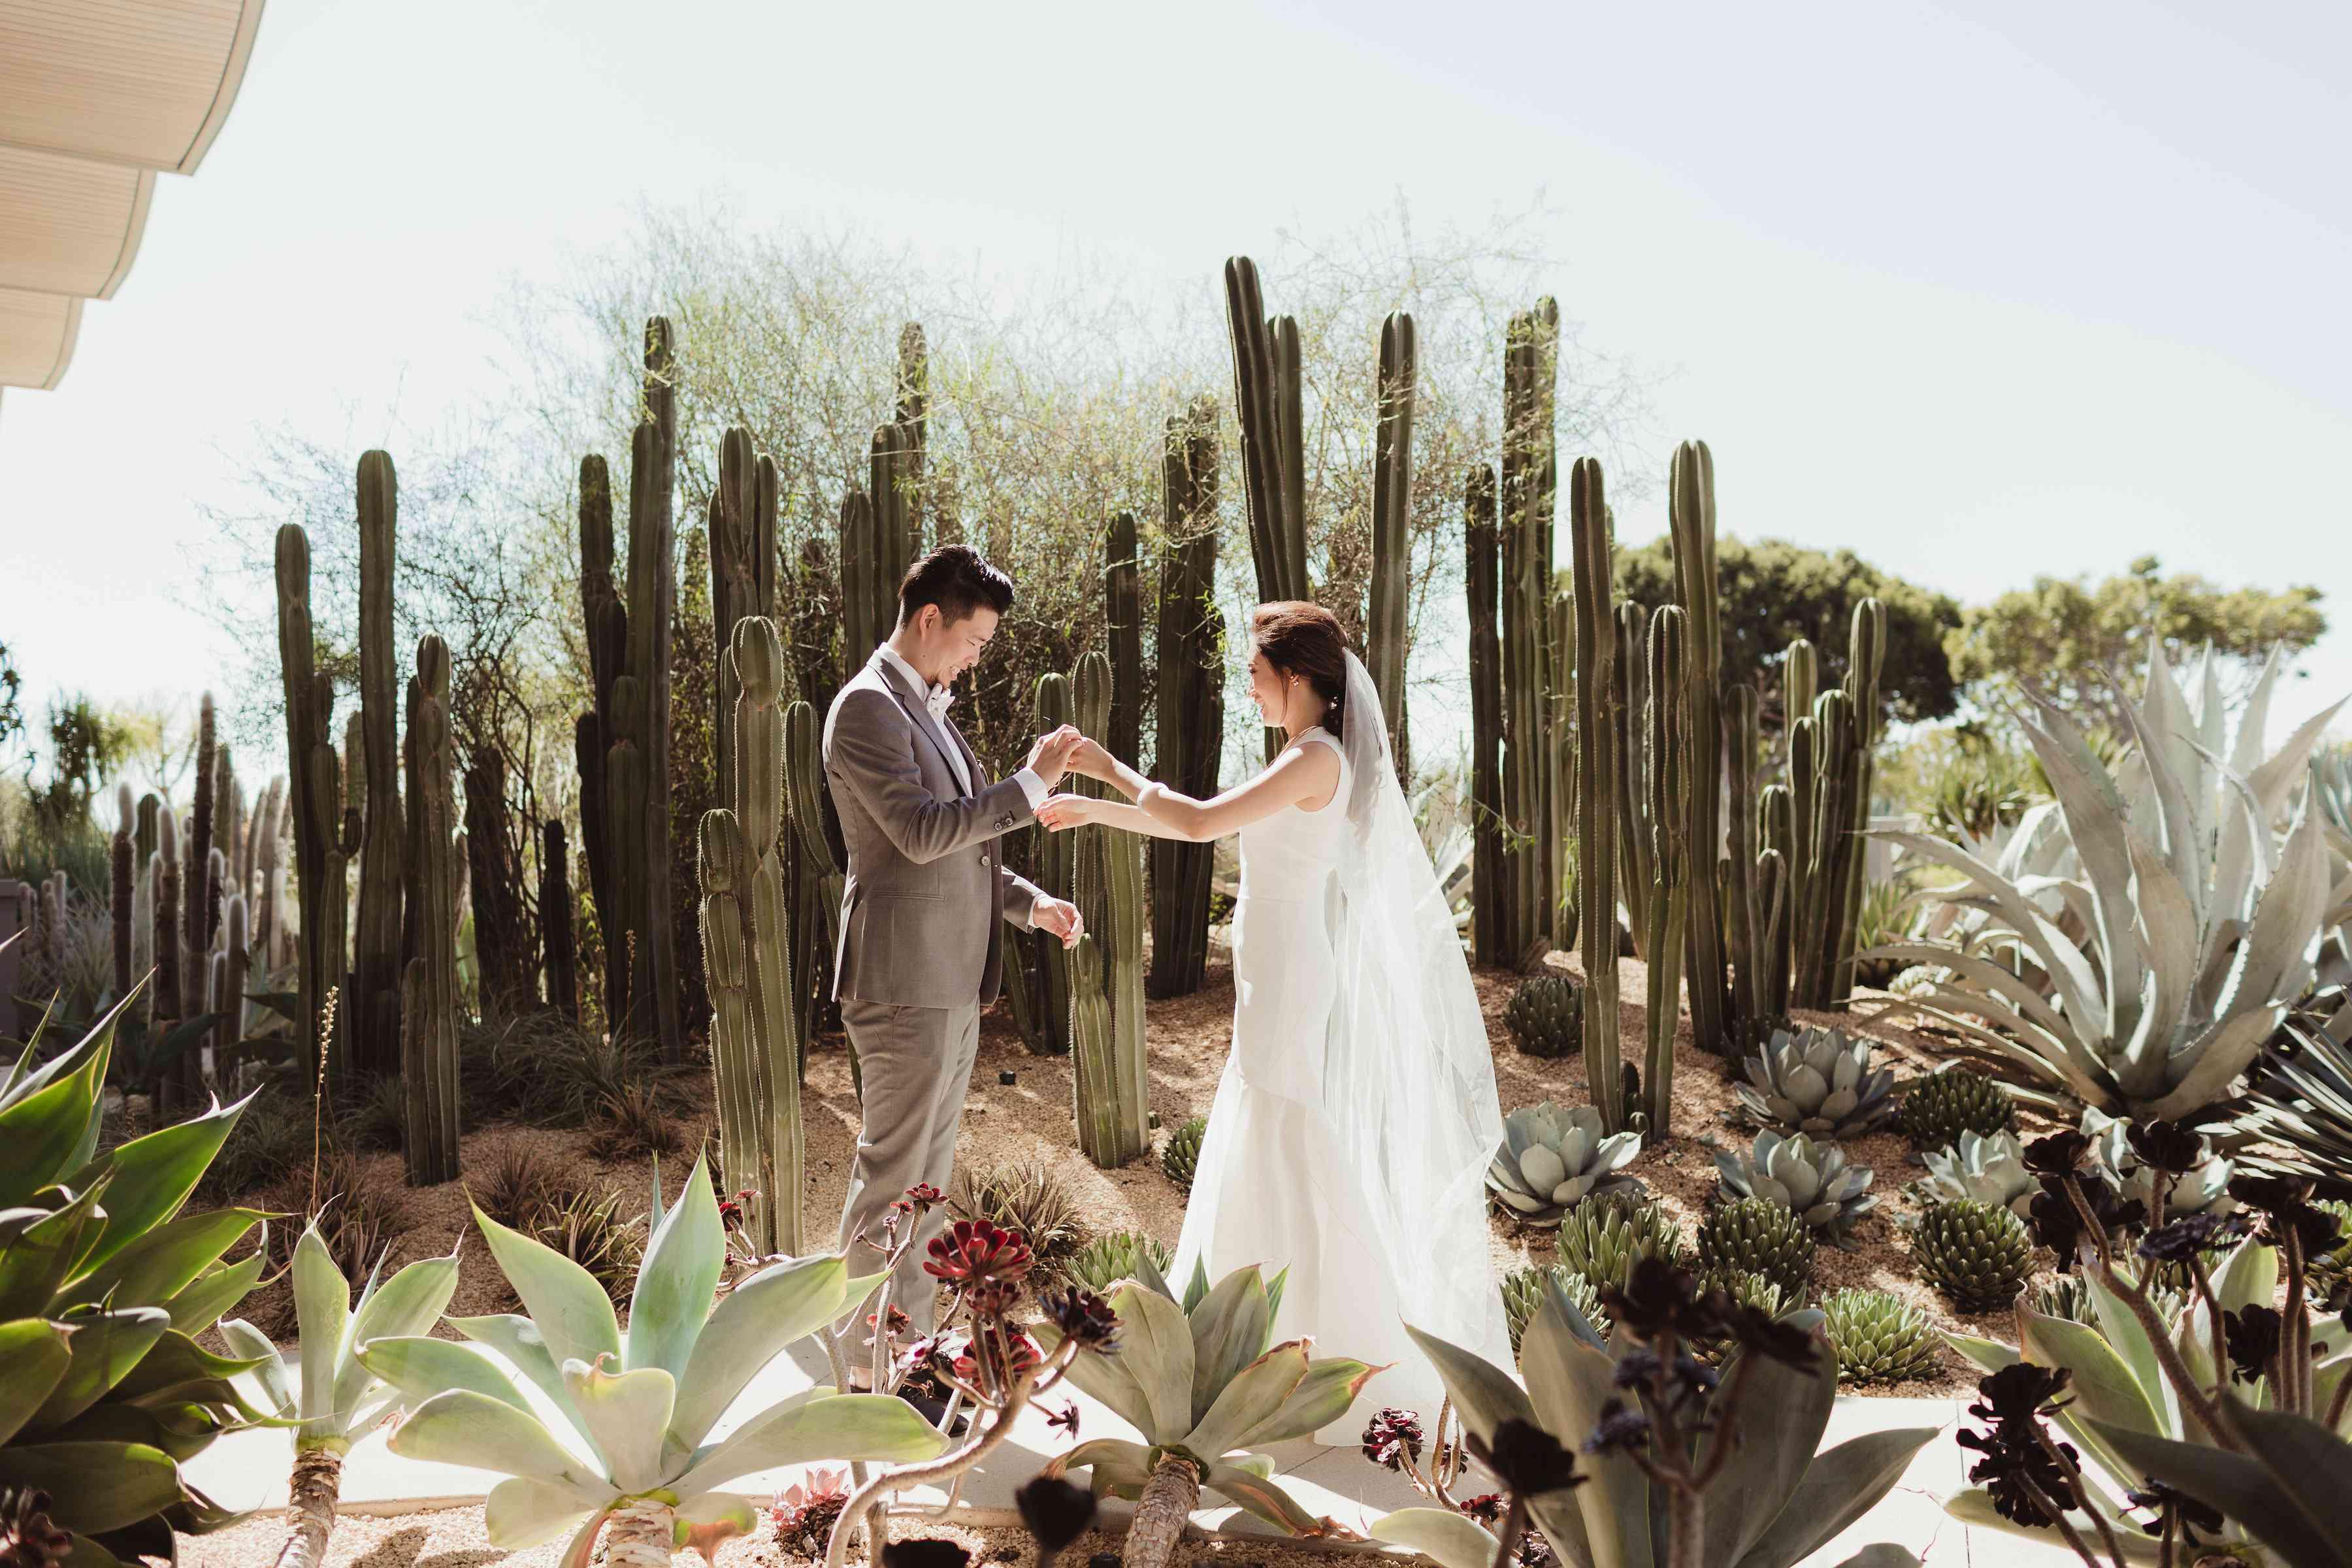 Bride and Groom Near Cactuses